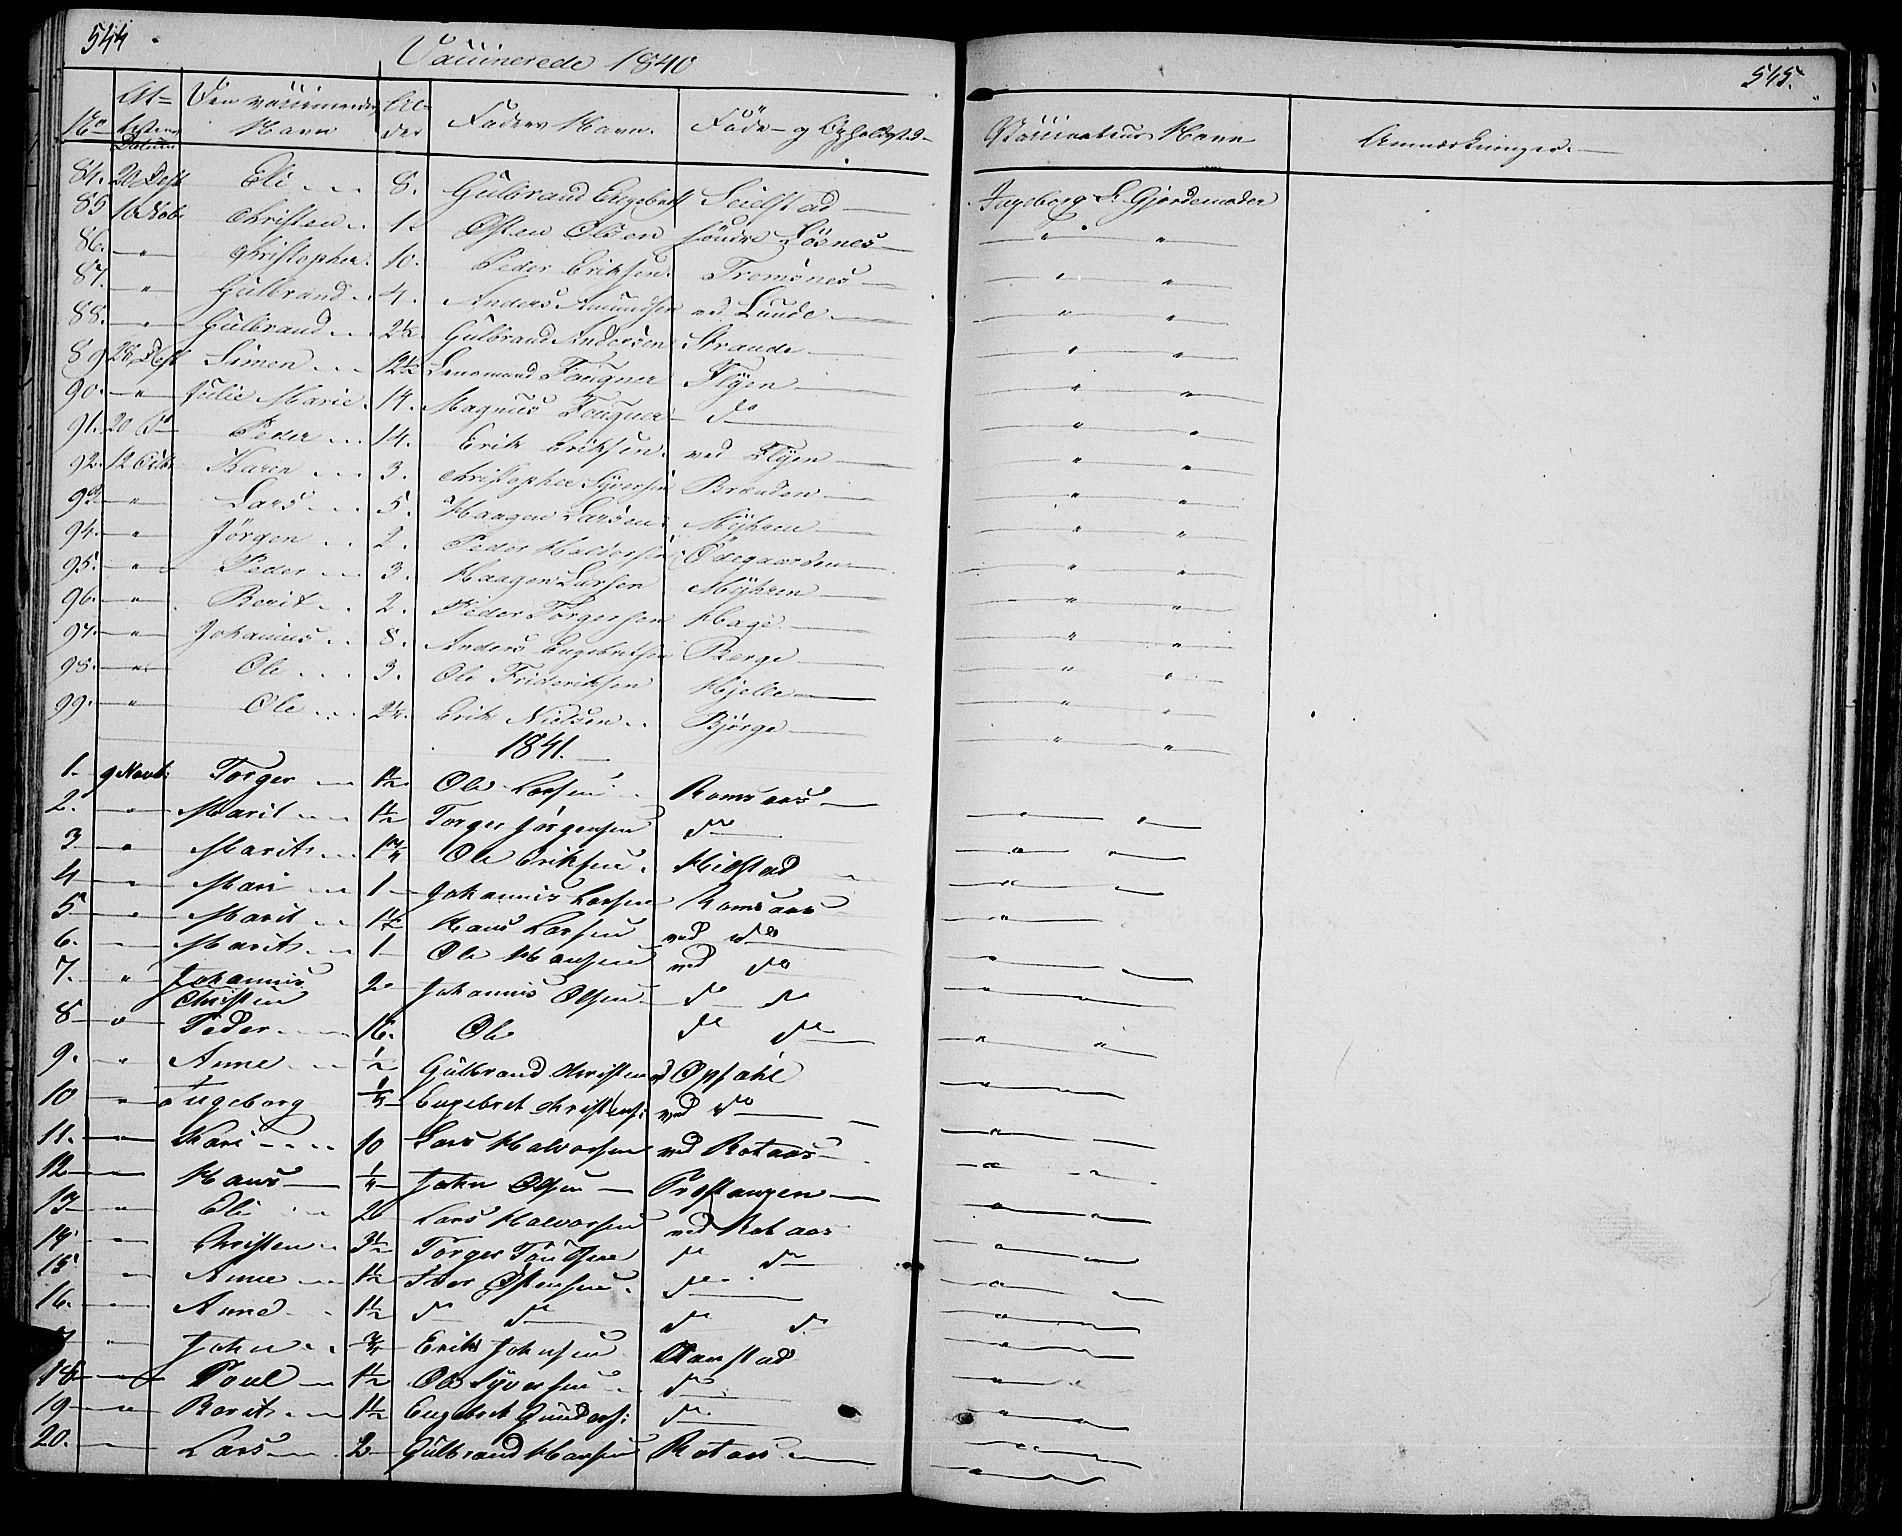 SAH, Ringebu prestekontor, Klokkerbok nr. 2, 1839-1853, s. 544-545